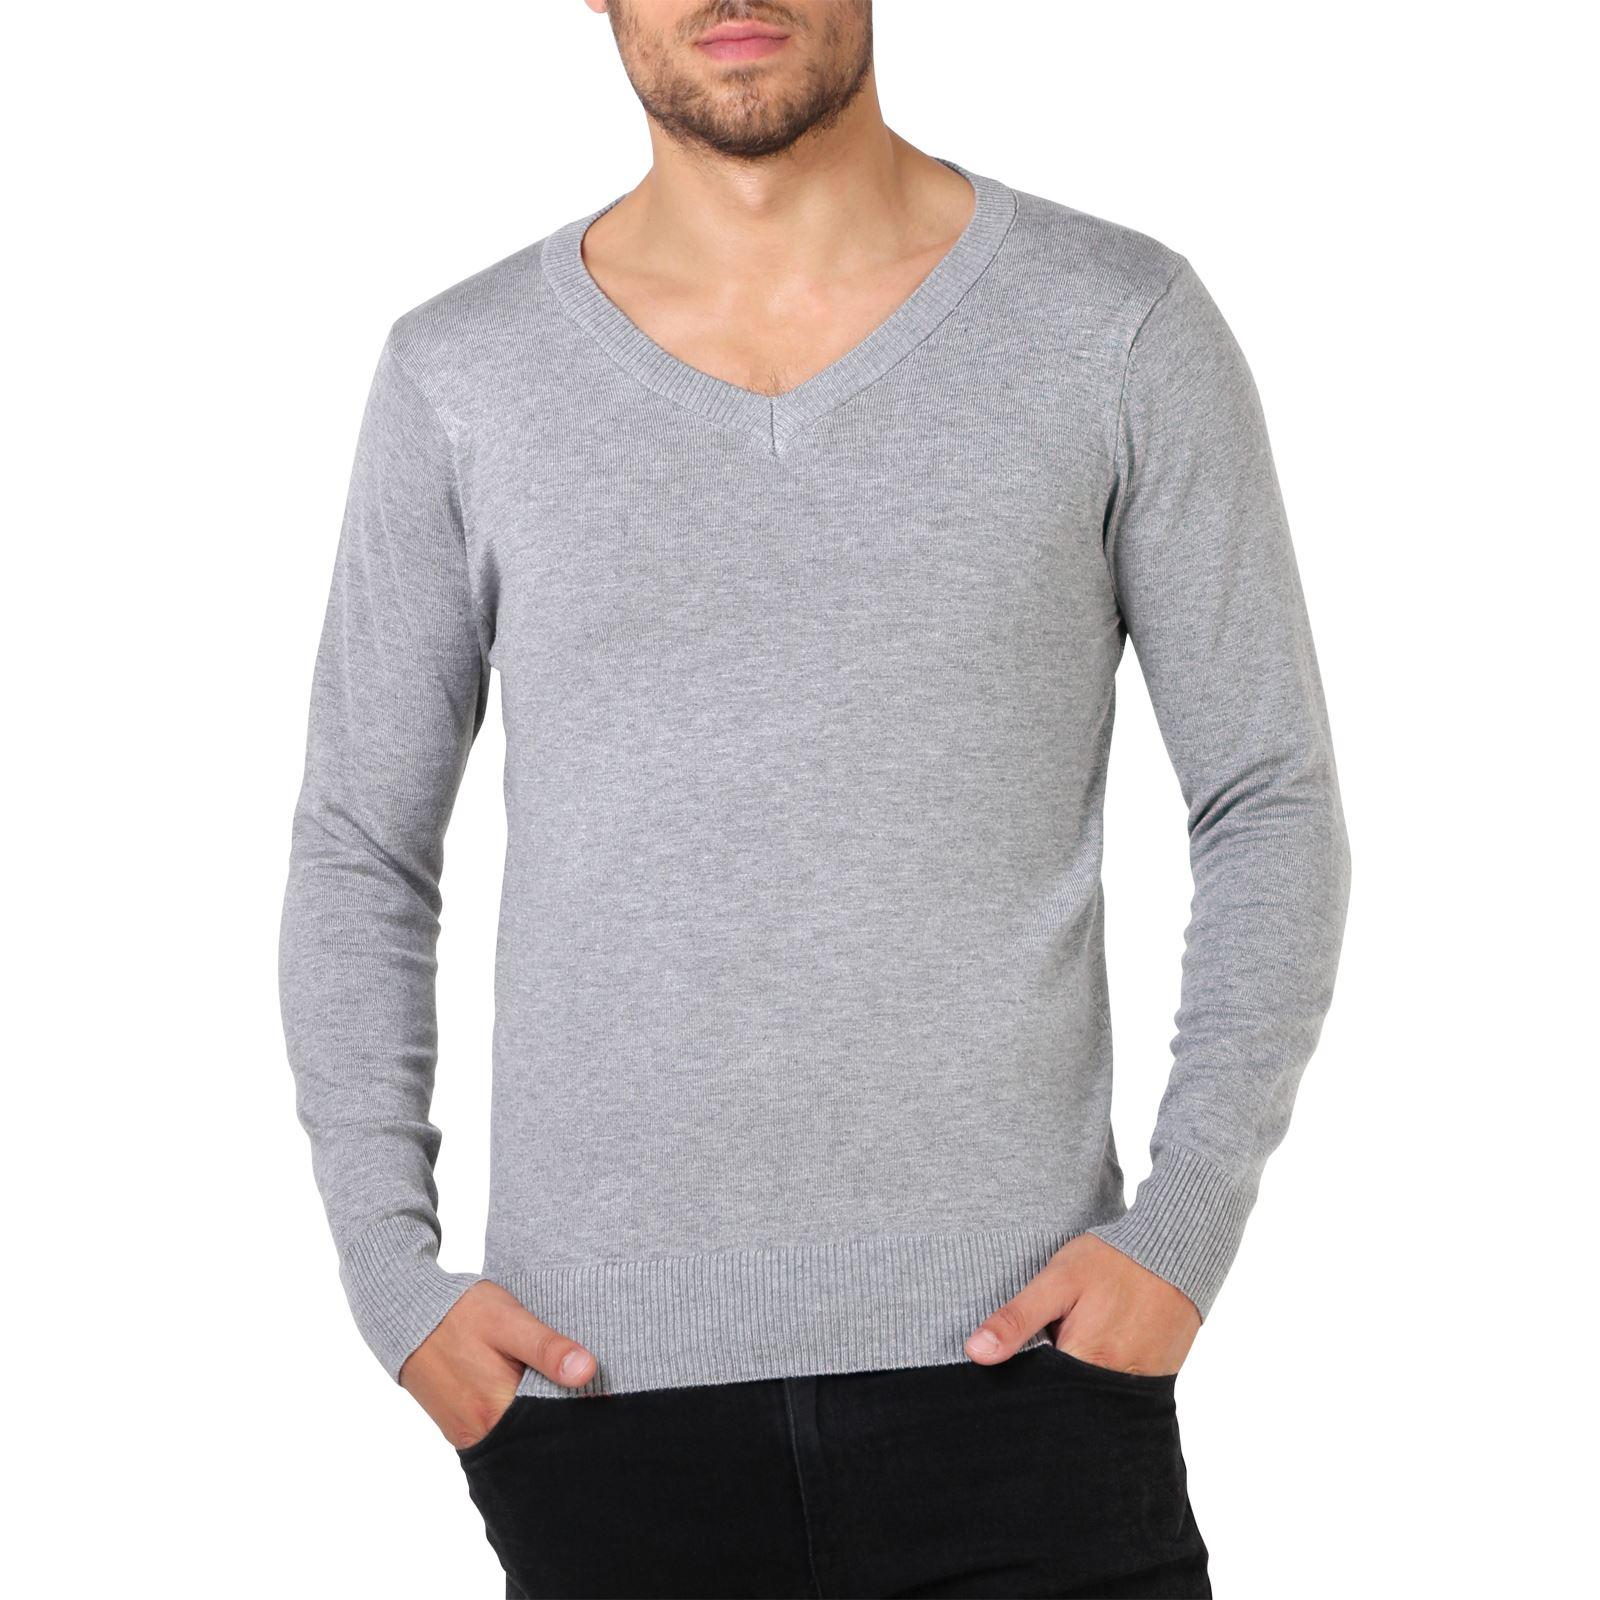 Mens-Soft-Cotton-Knit-Plain-V-Neck-Fashion-Jumper-Knitwear-Sweater-Pullover-Work